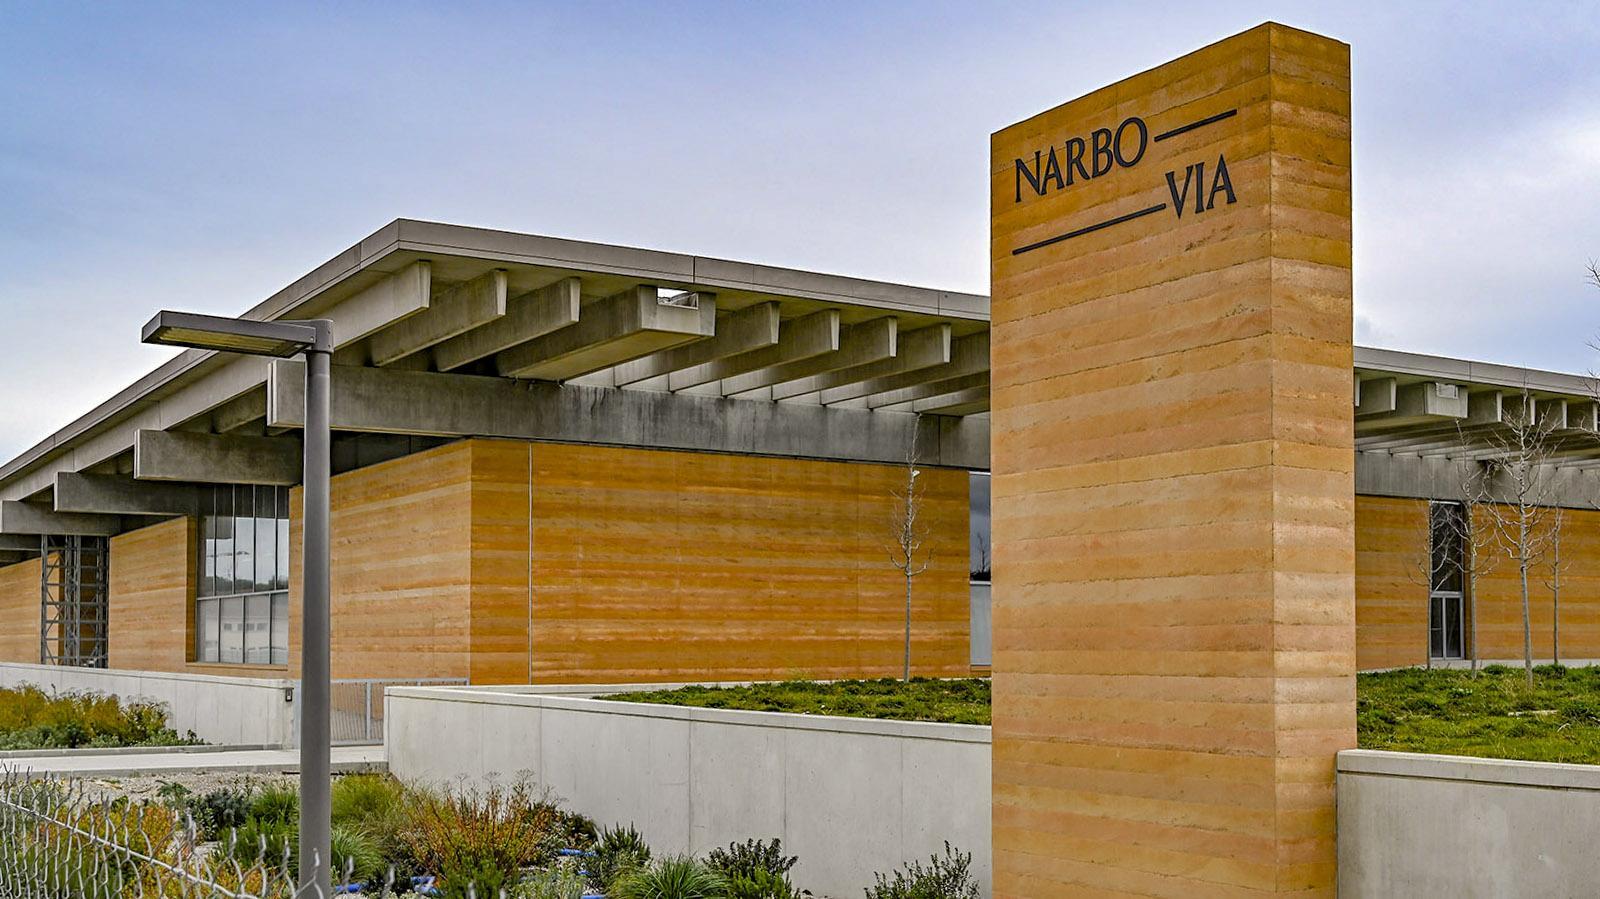 Das Antikenmuseum Narbo Via in Narbonne. Foto: Hilke Maunder